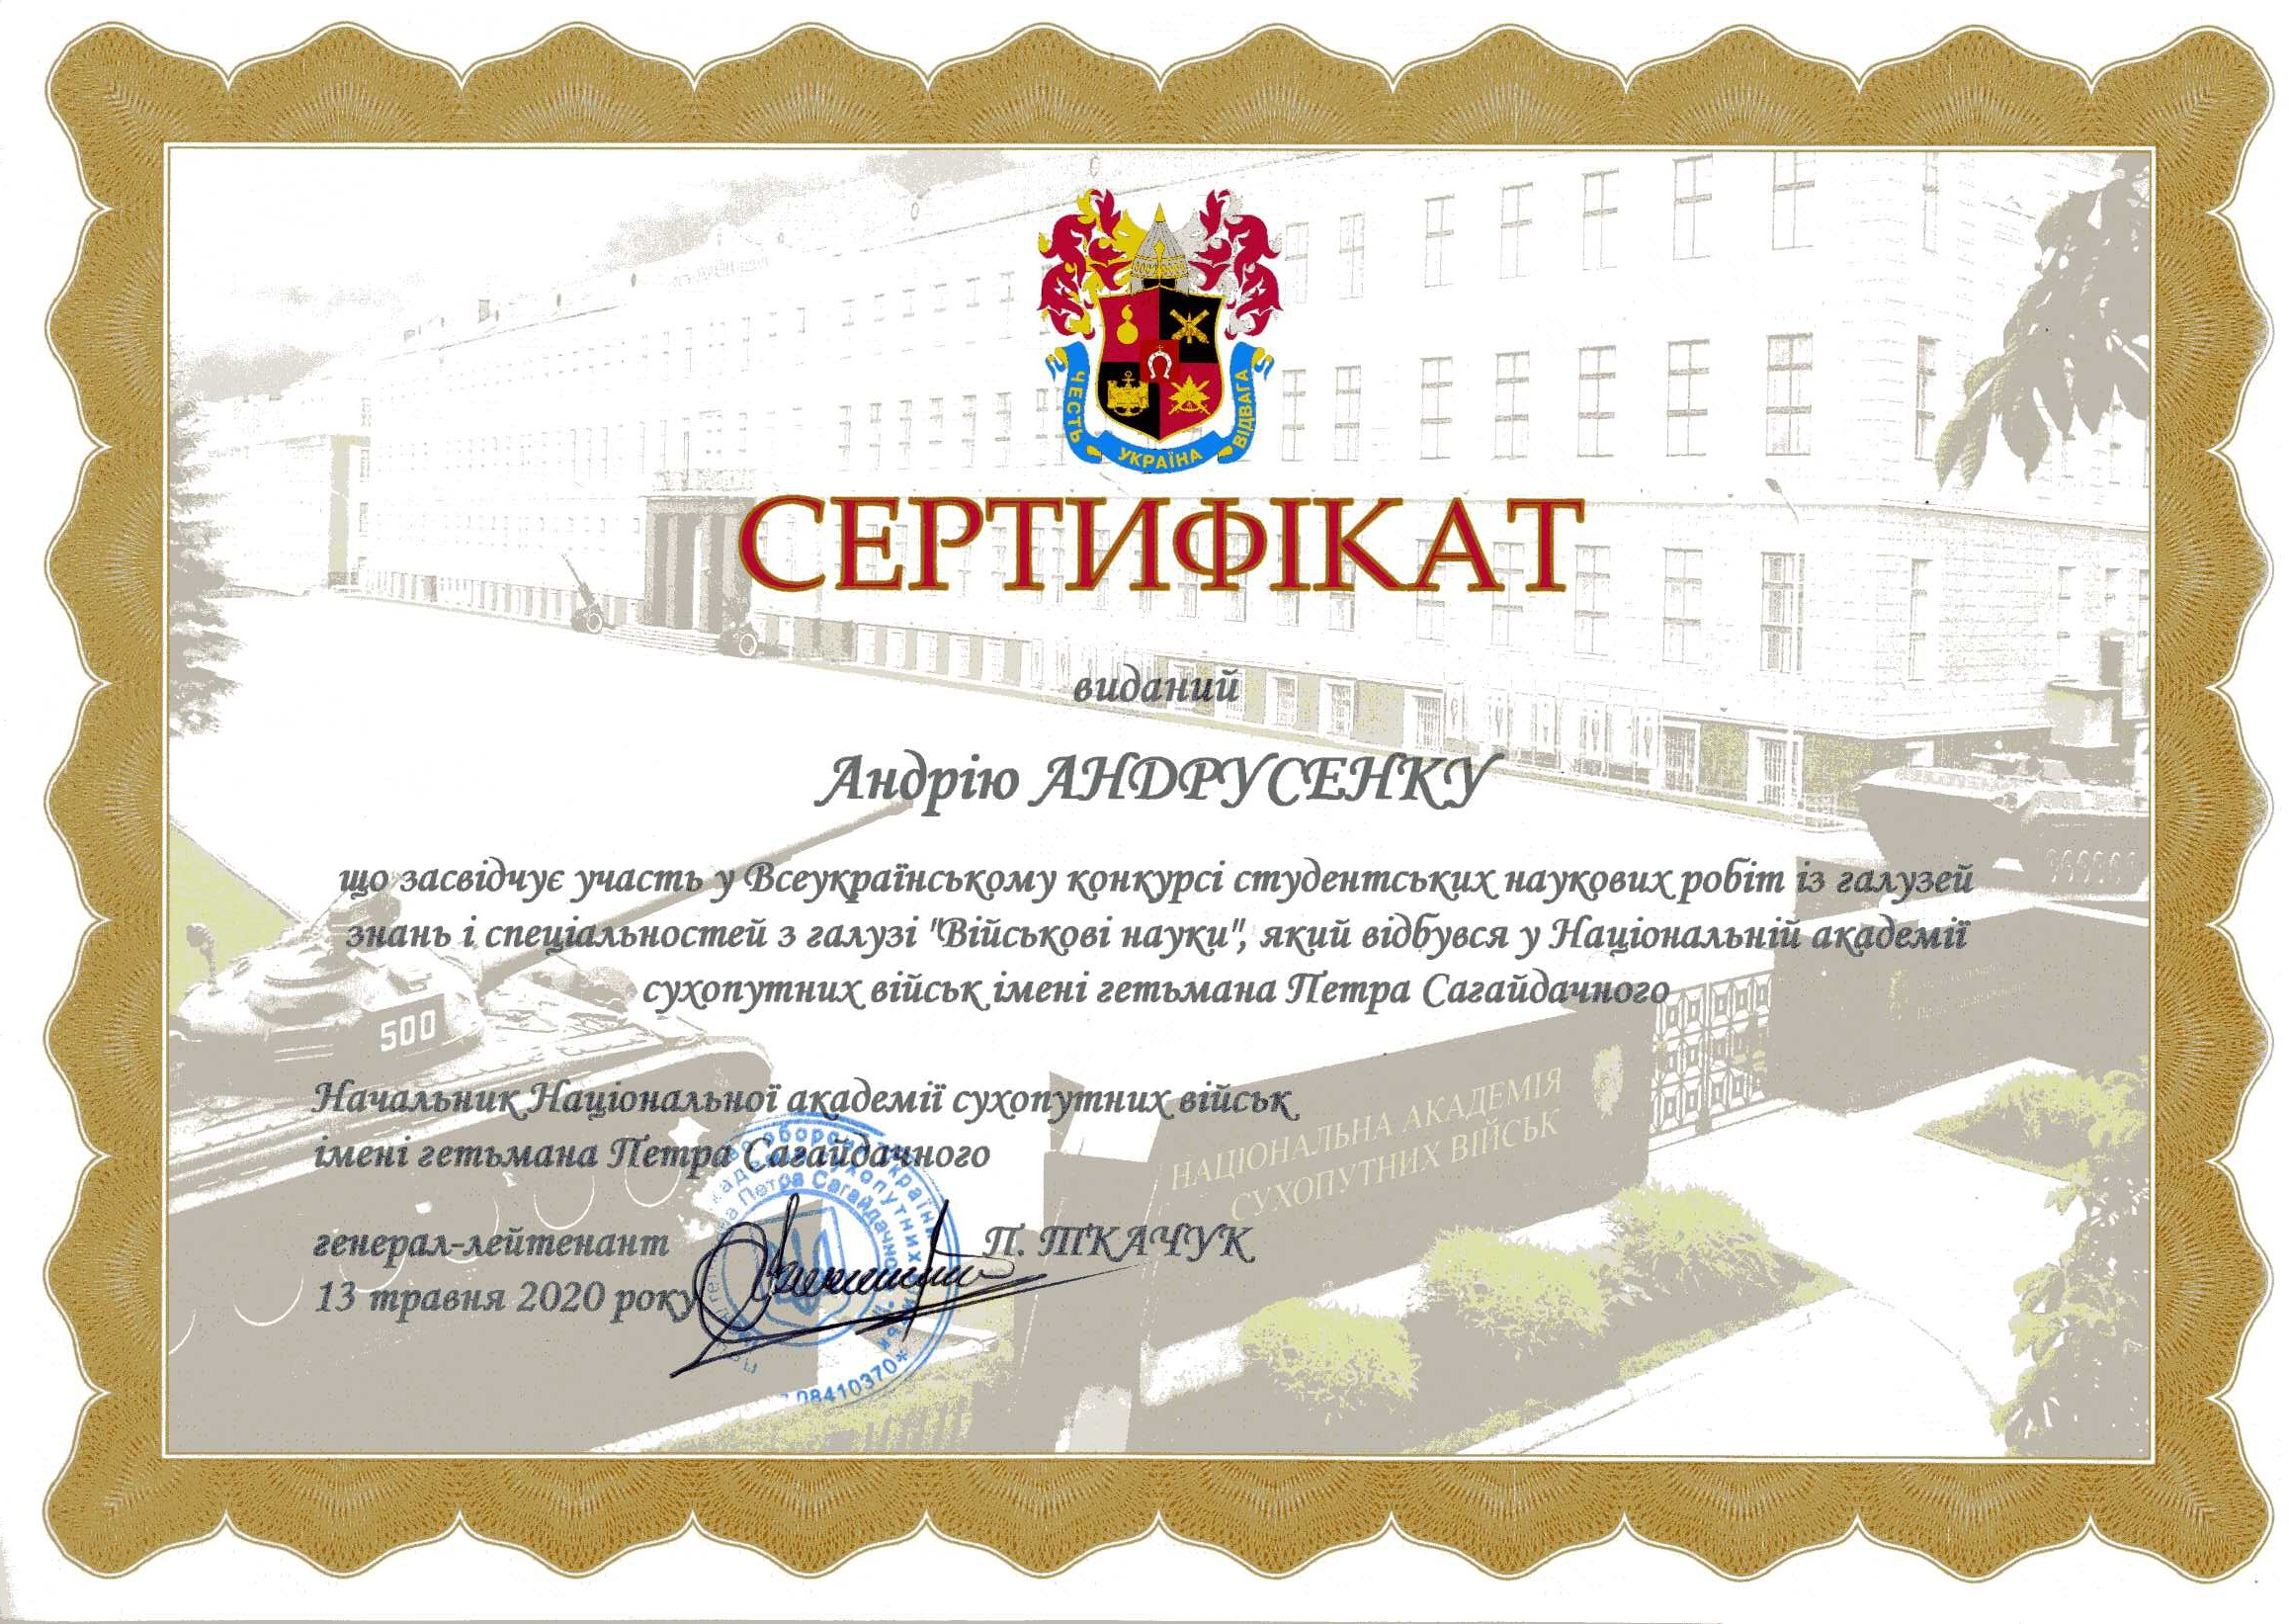 Сертифікат Андрусенко участь Львів 2020